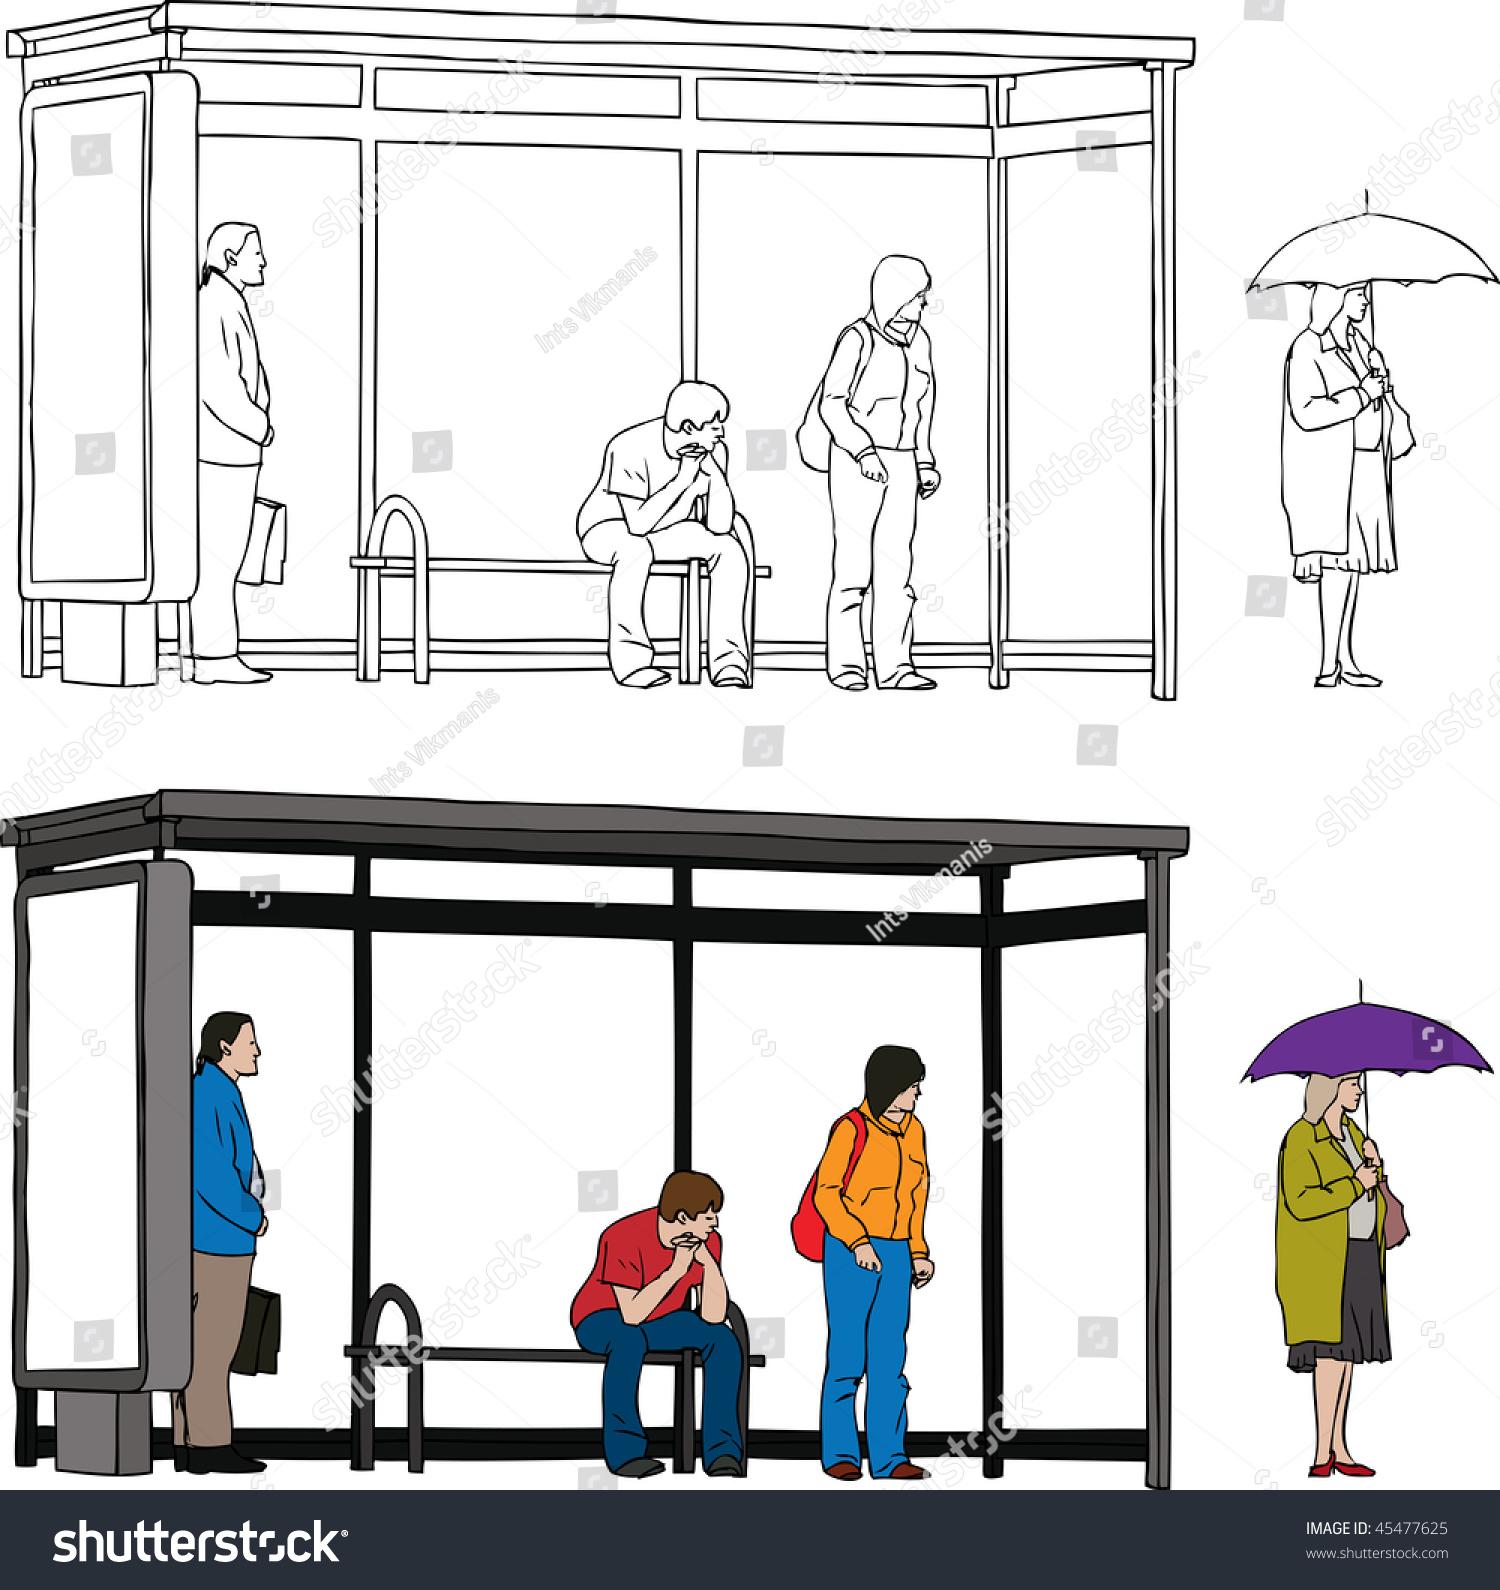 sketch bus stop blank billboard people stock illustration Fire Station Clip Art Train Station Clip Art